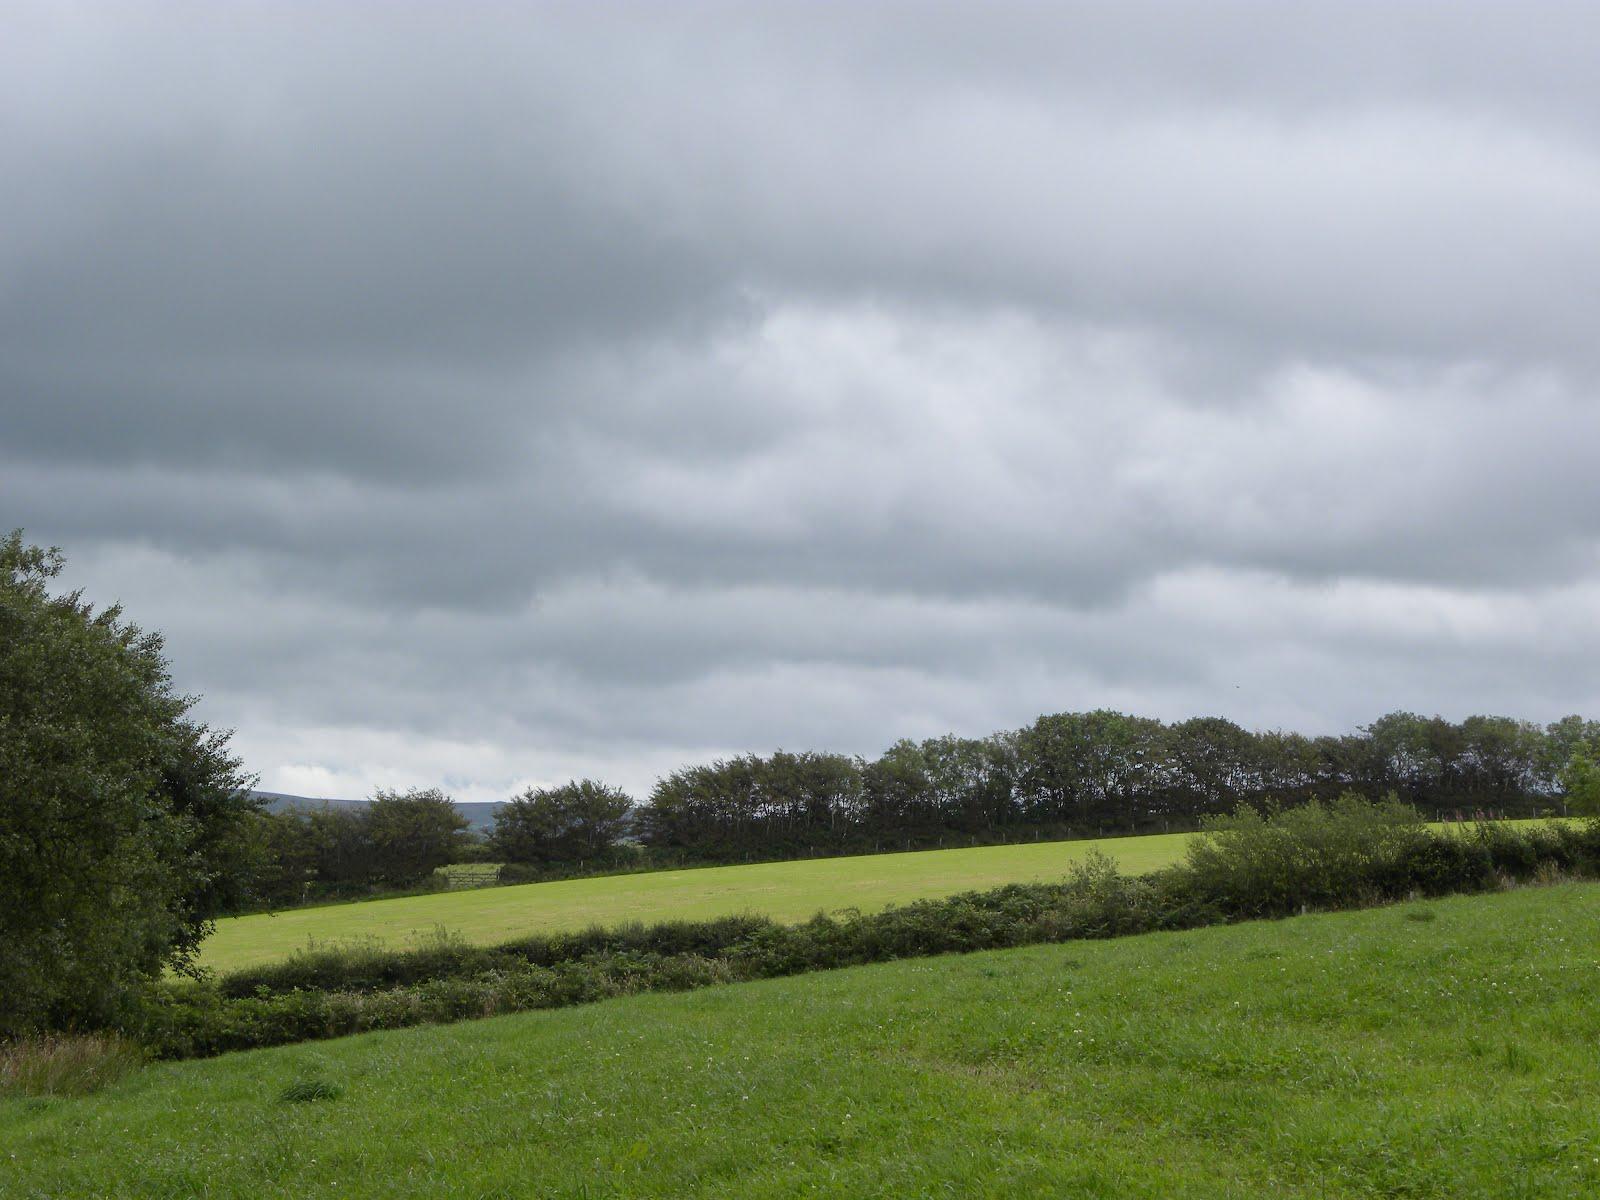 Ruta's Ramblings: Overcast.